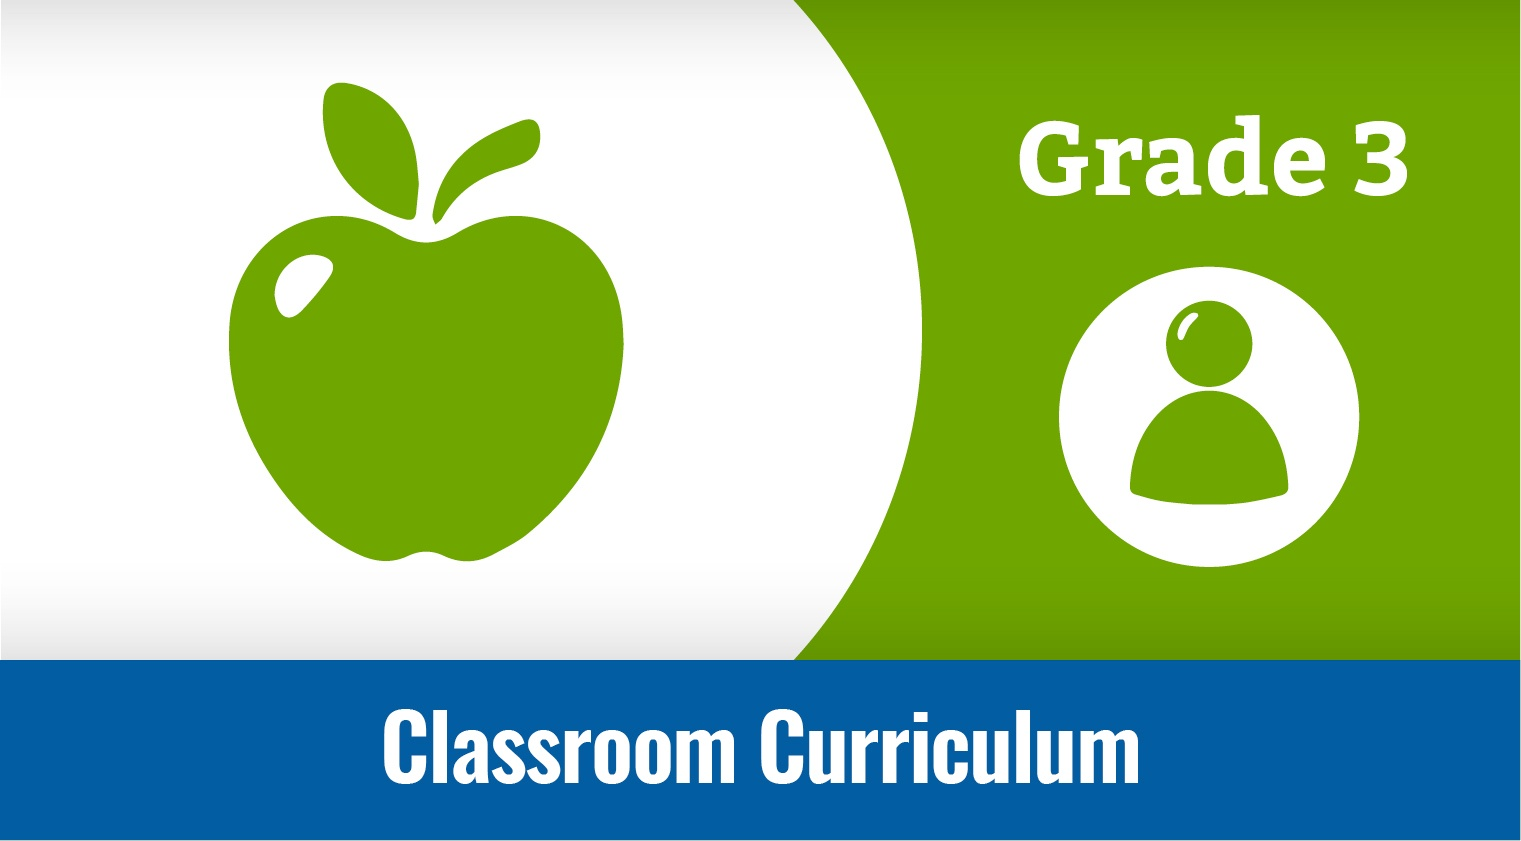 Grade 3 Classroom Curriculum - Hearty Heart and Friends